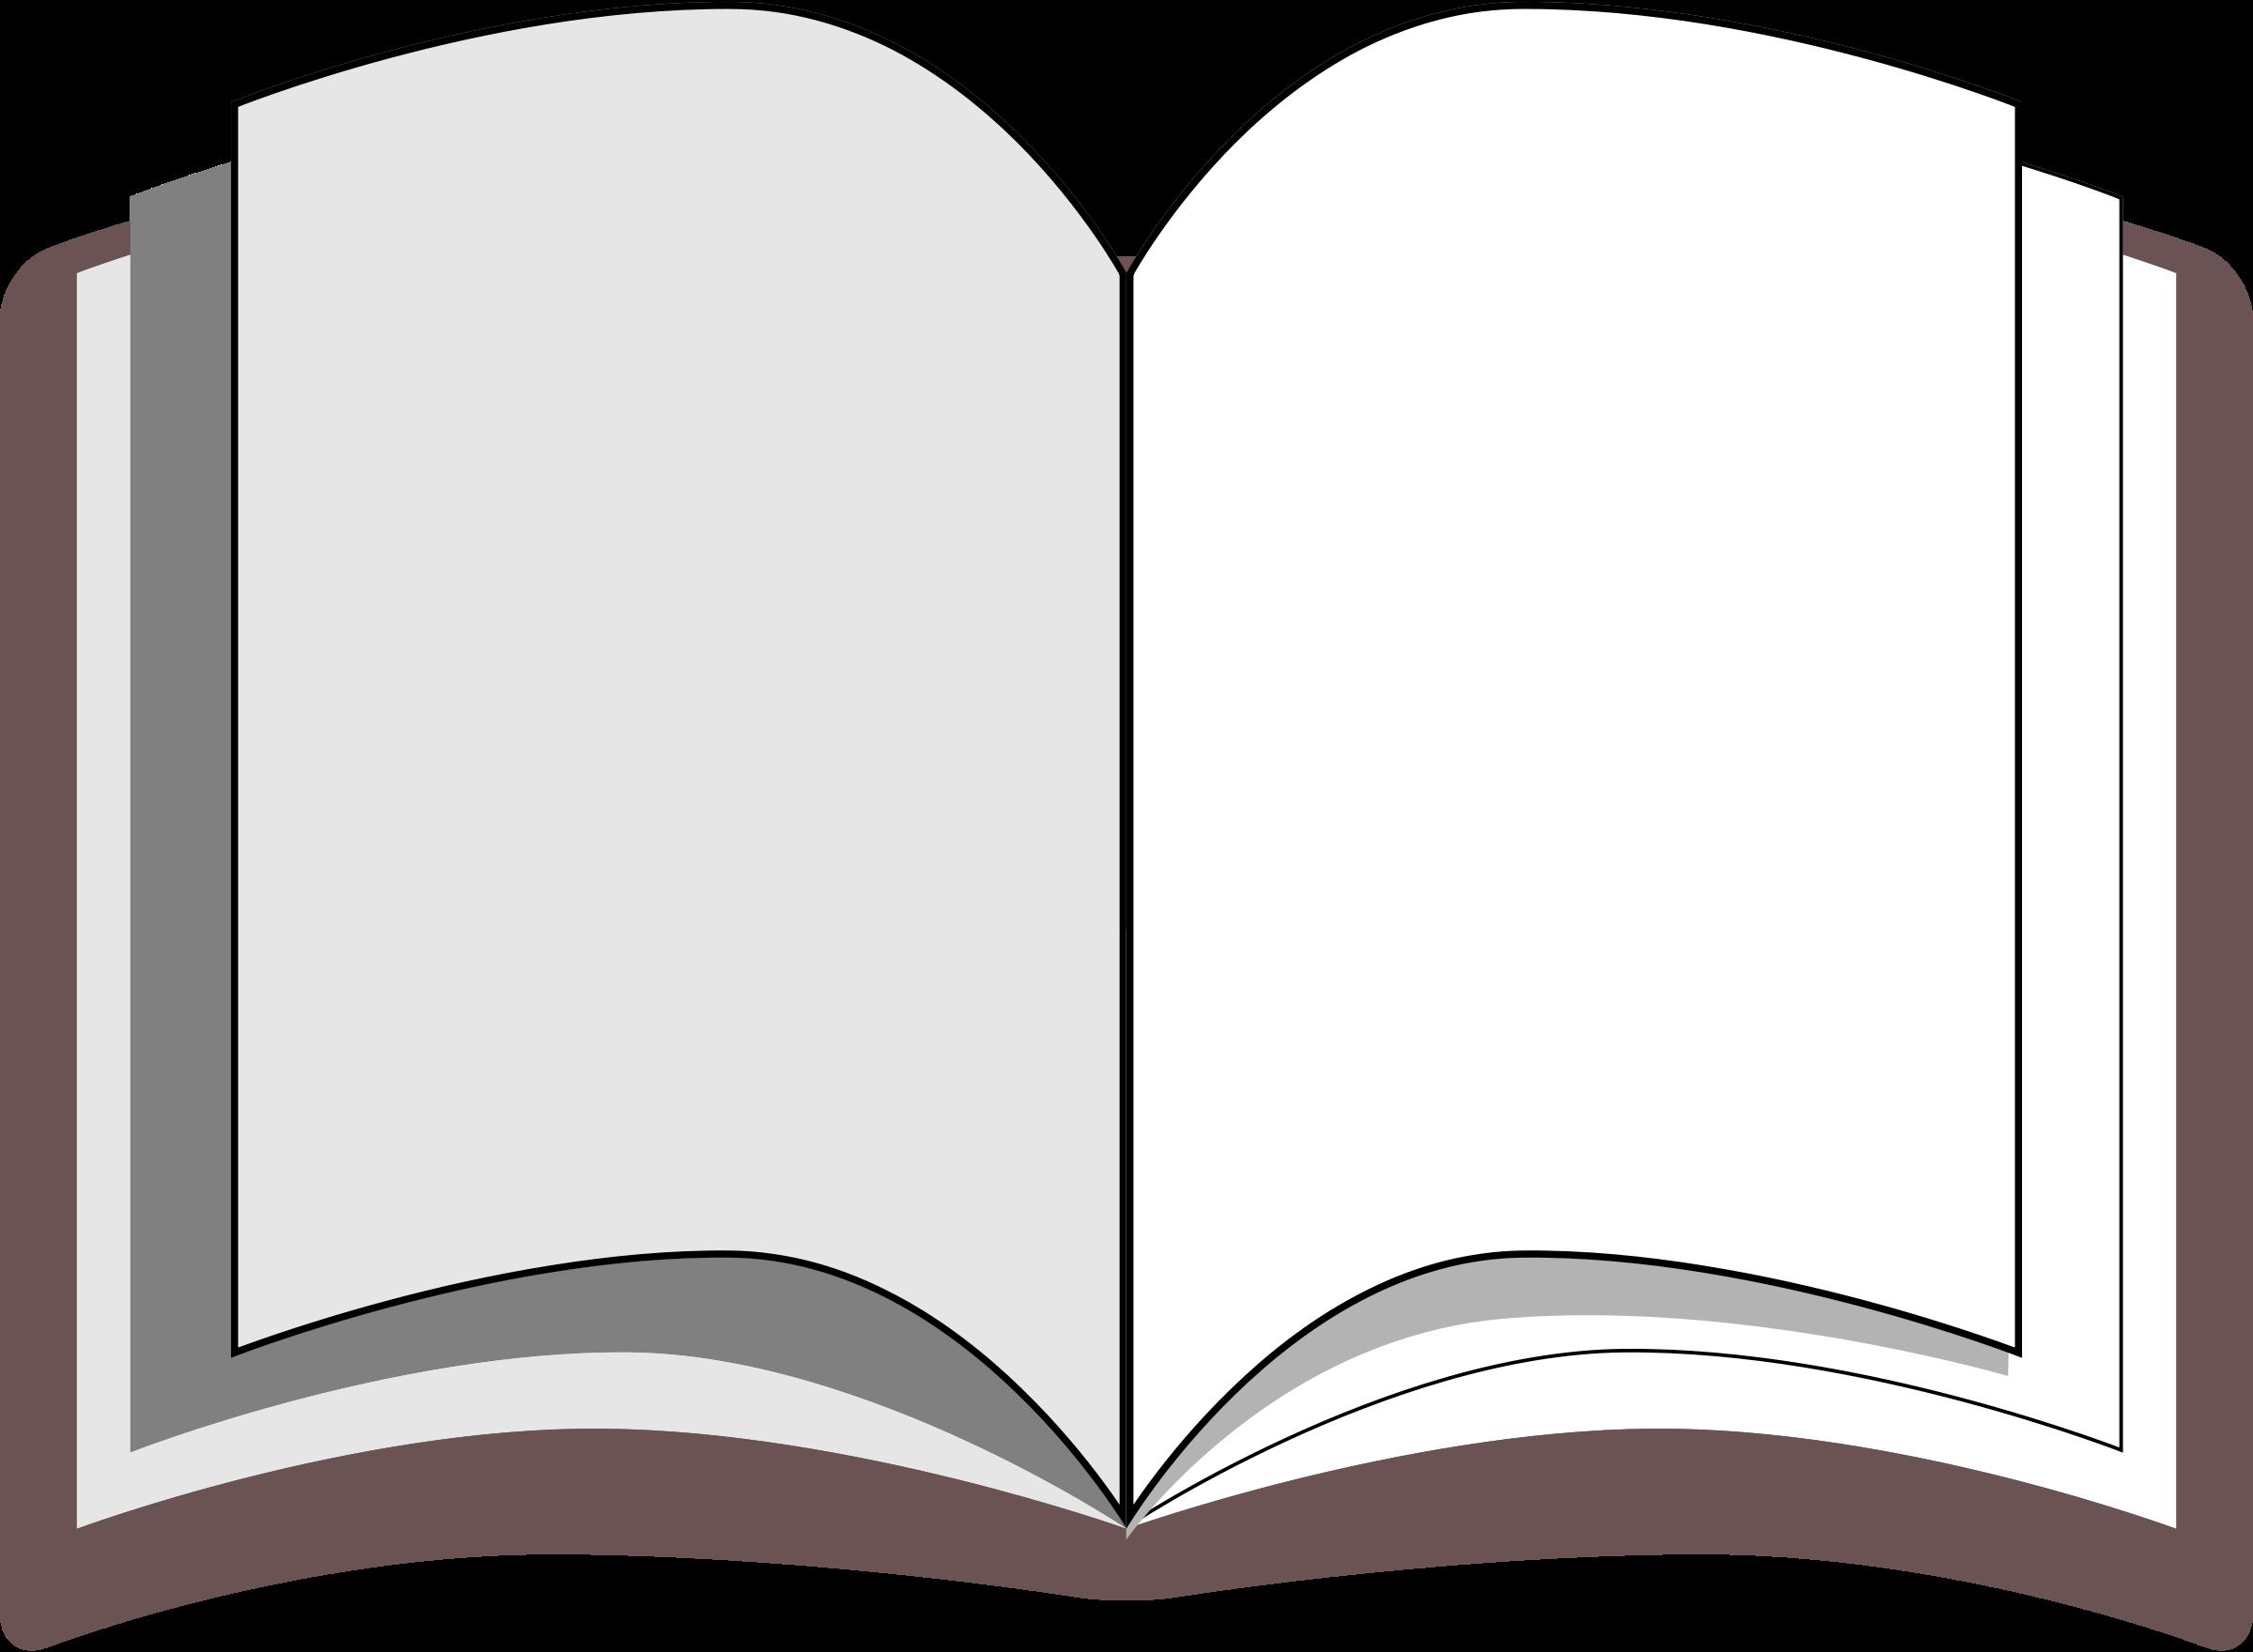 Free open book clipart public domain open book clip art.